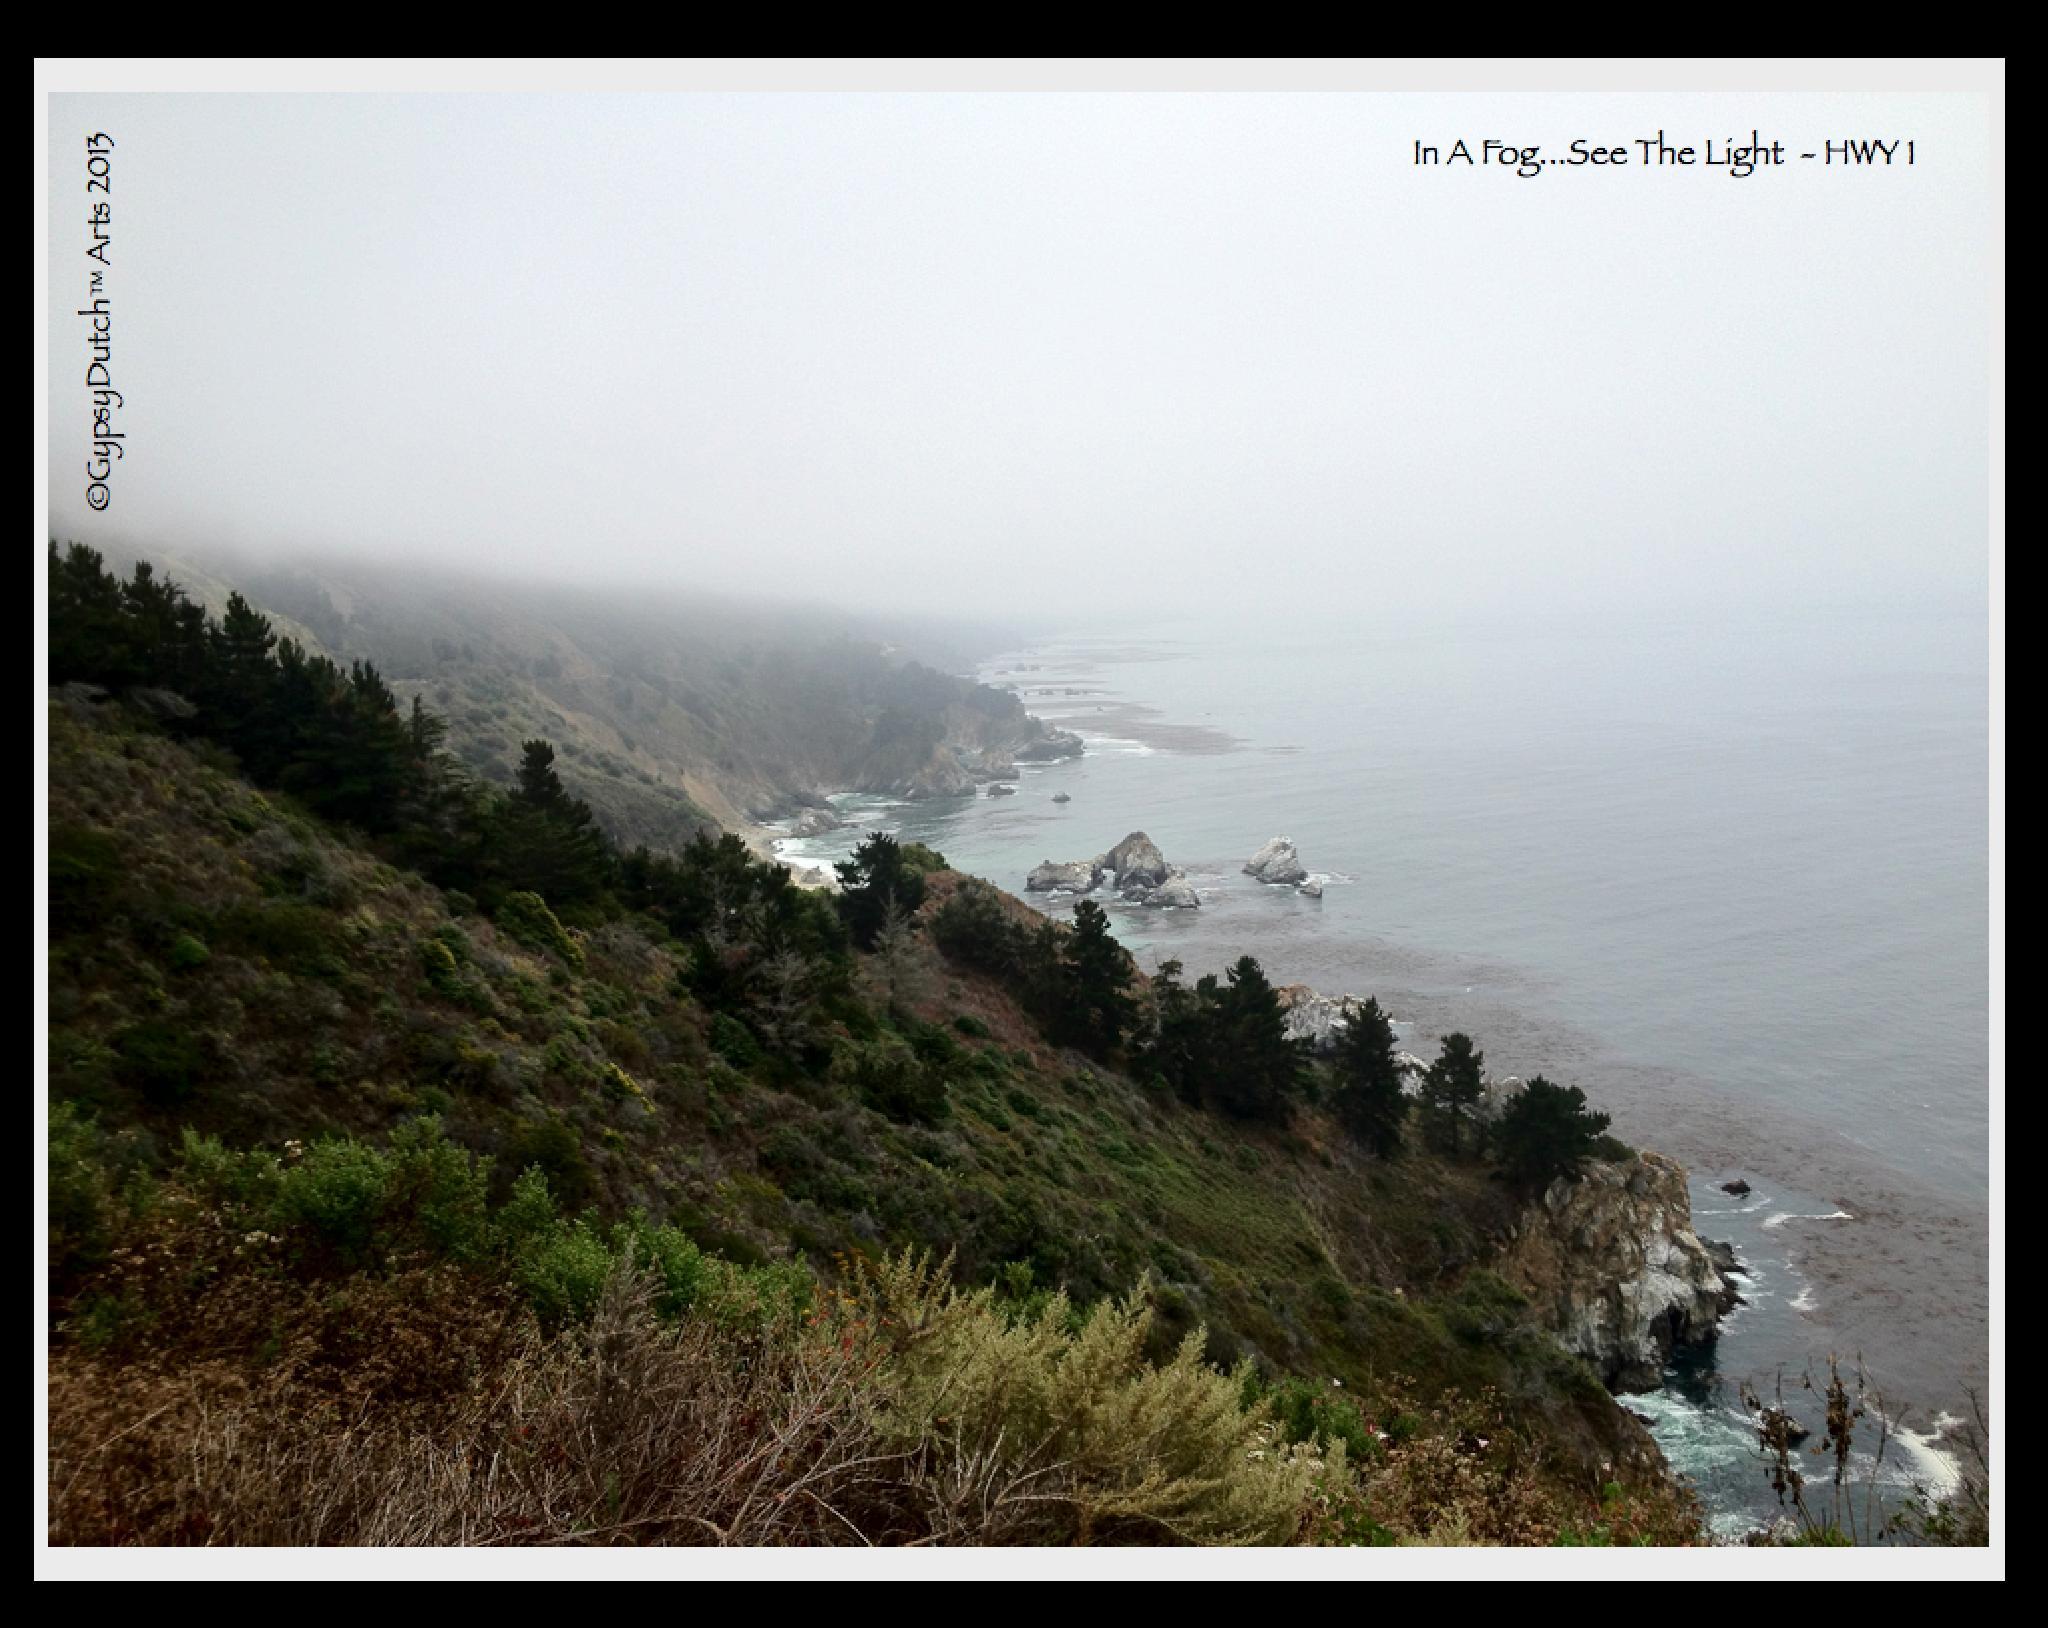 In A Fog...See The Light by GypsyDutch